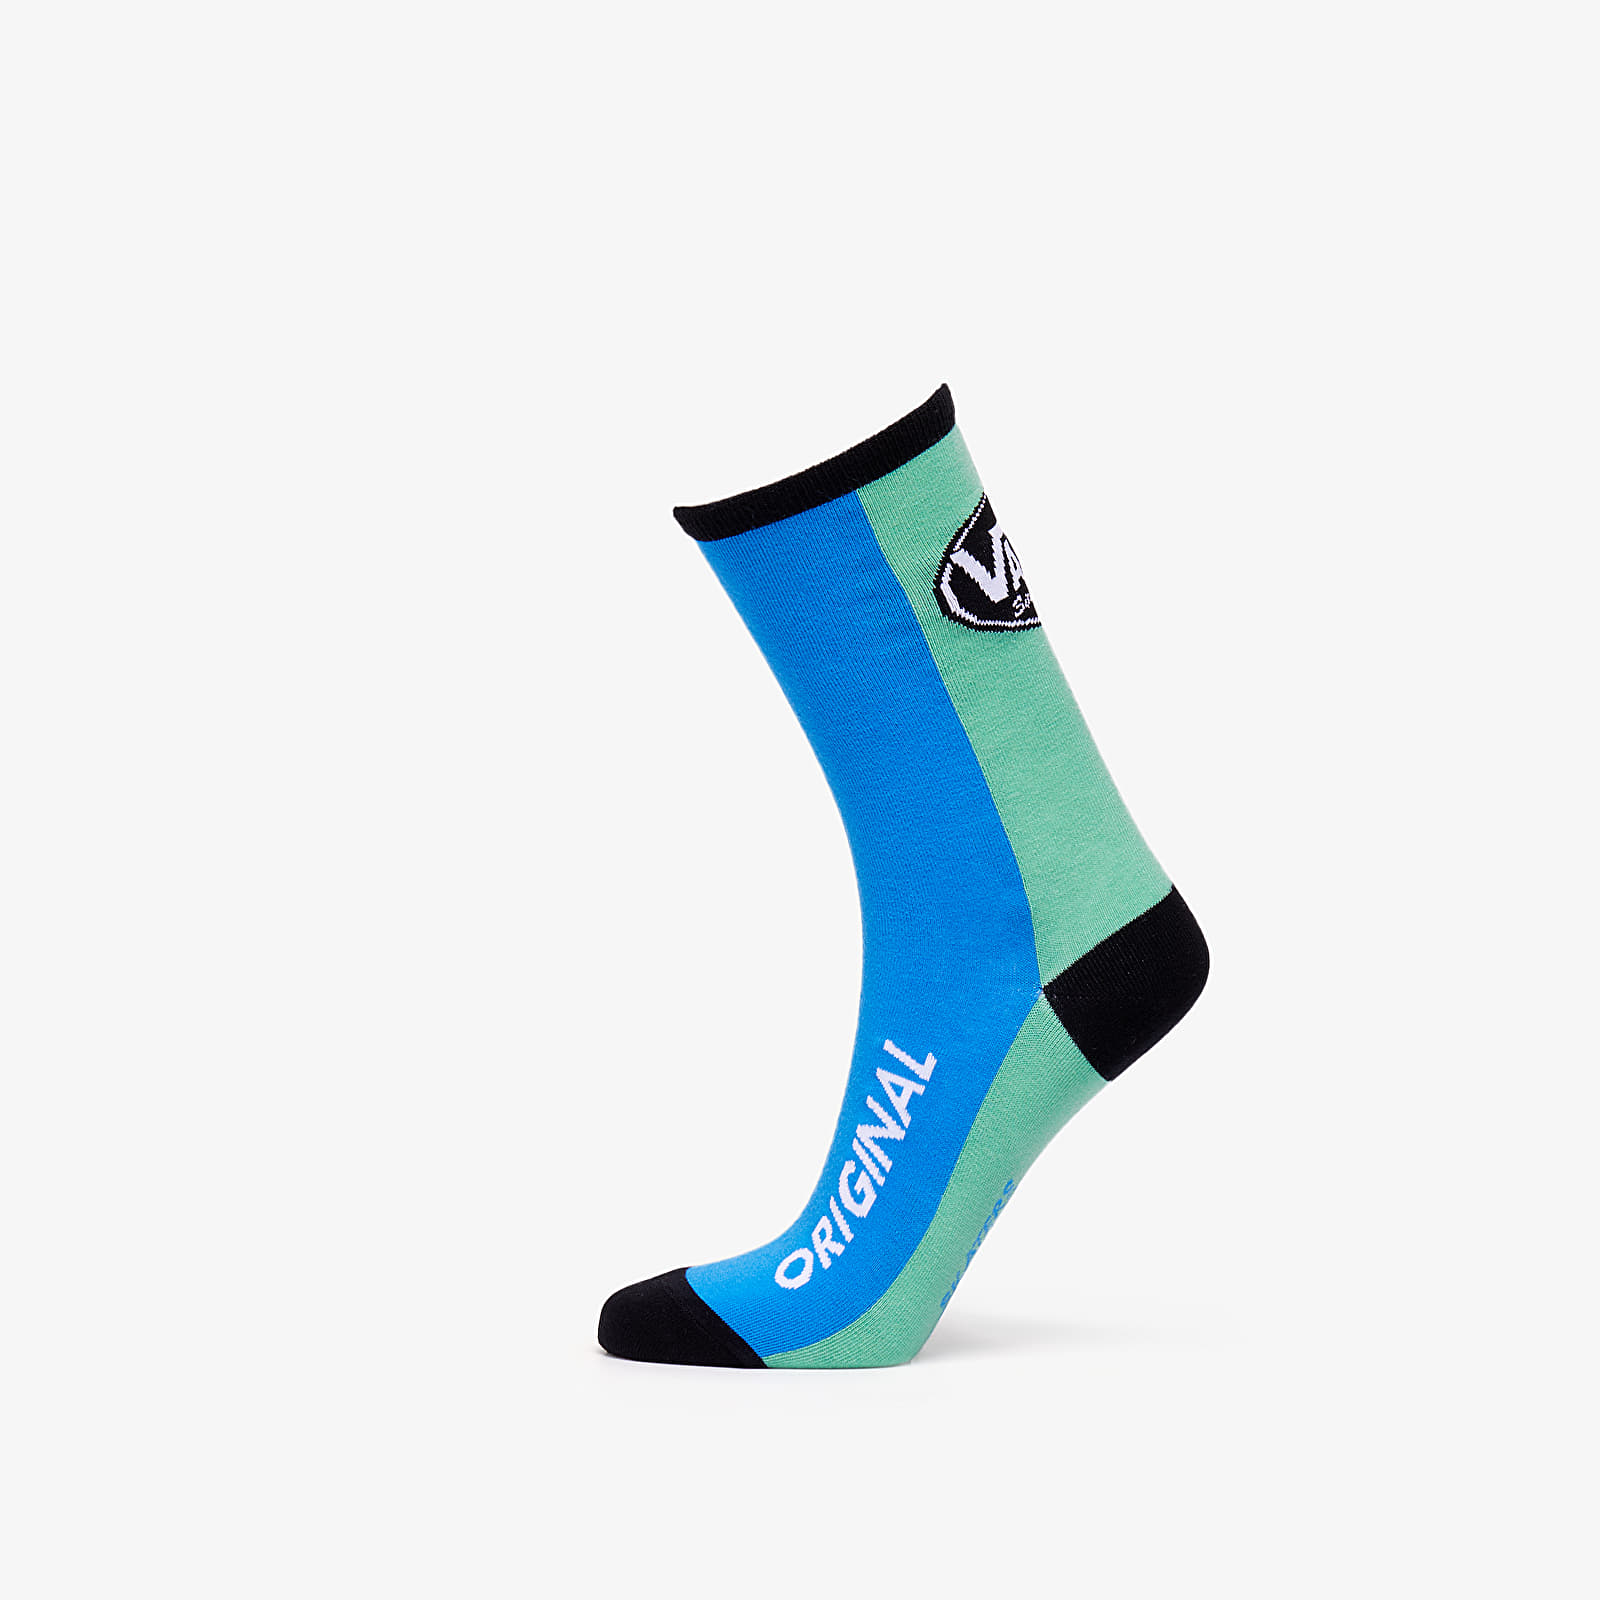 Ponožky Vans Ramp Tested Socks Green Spruce